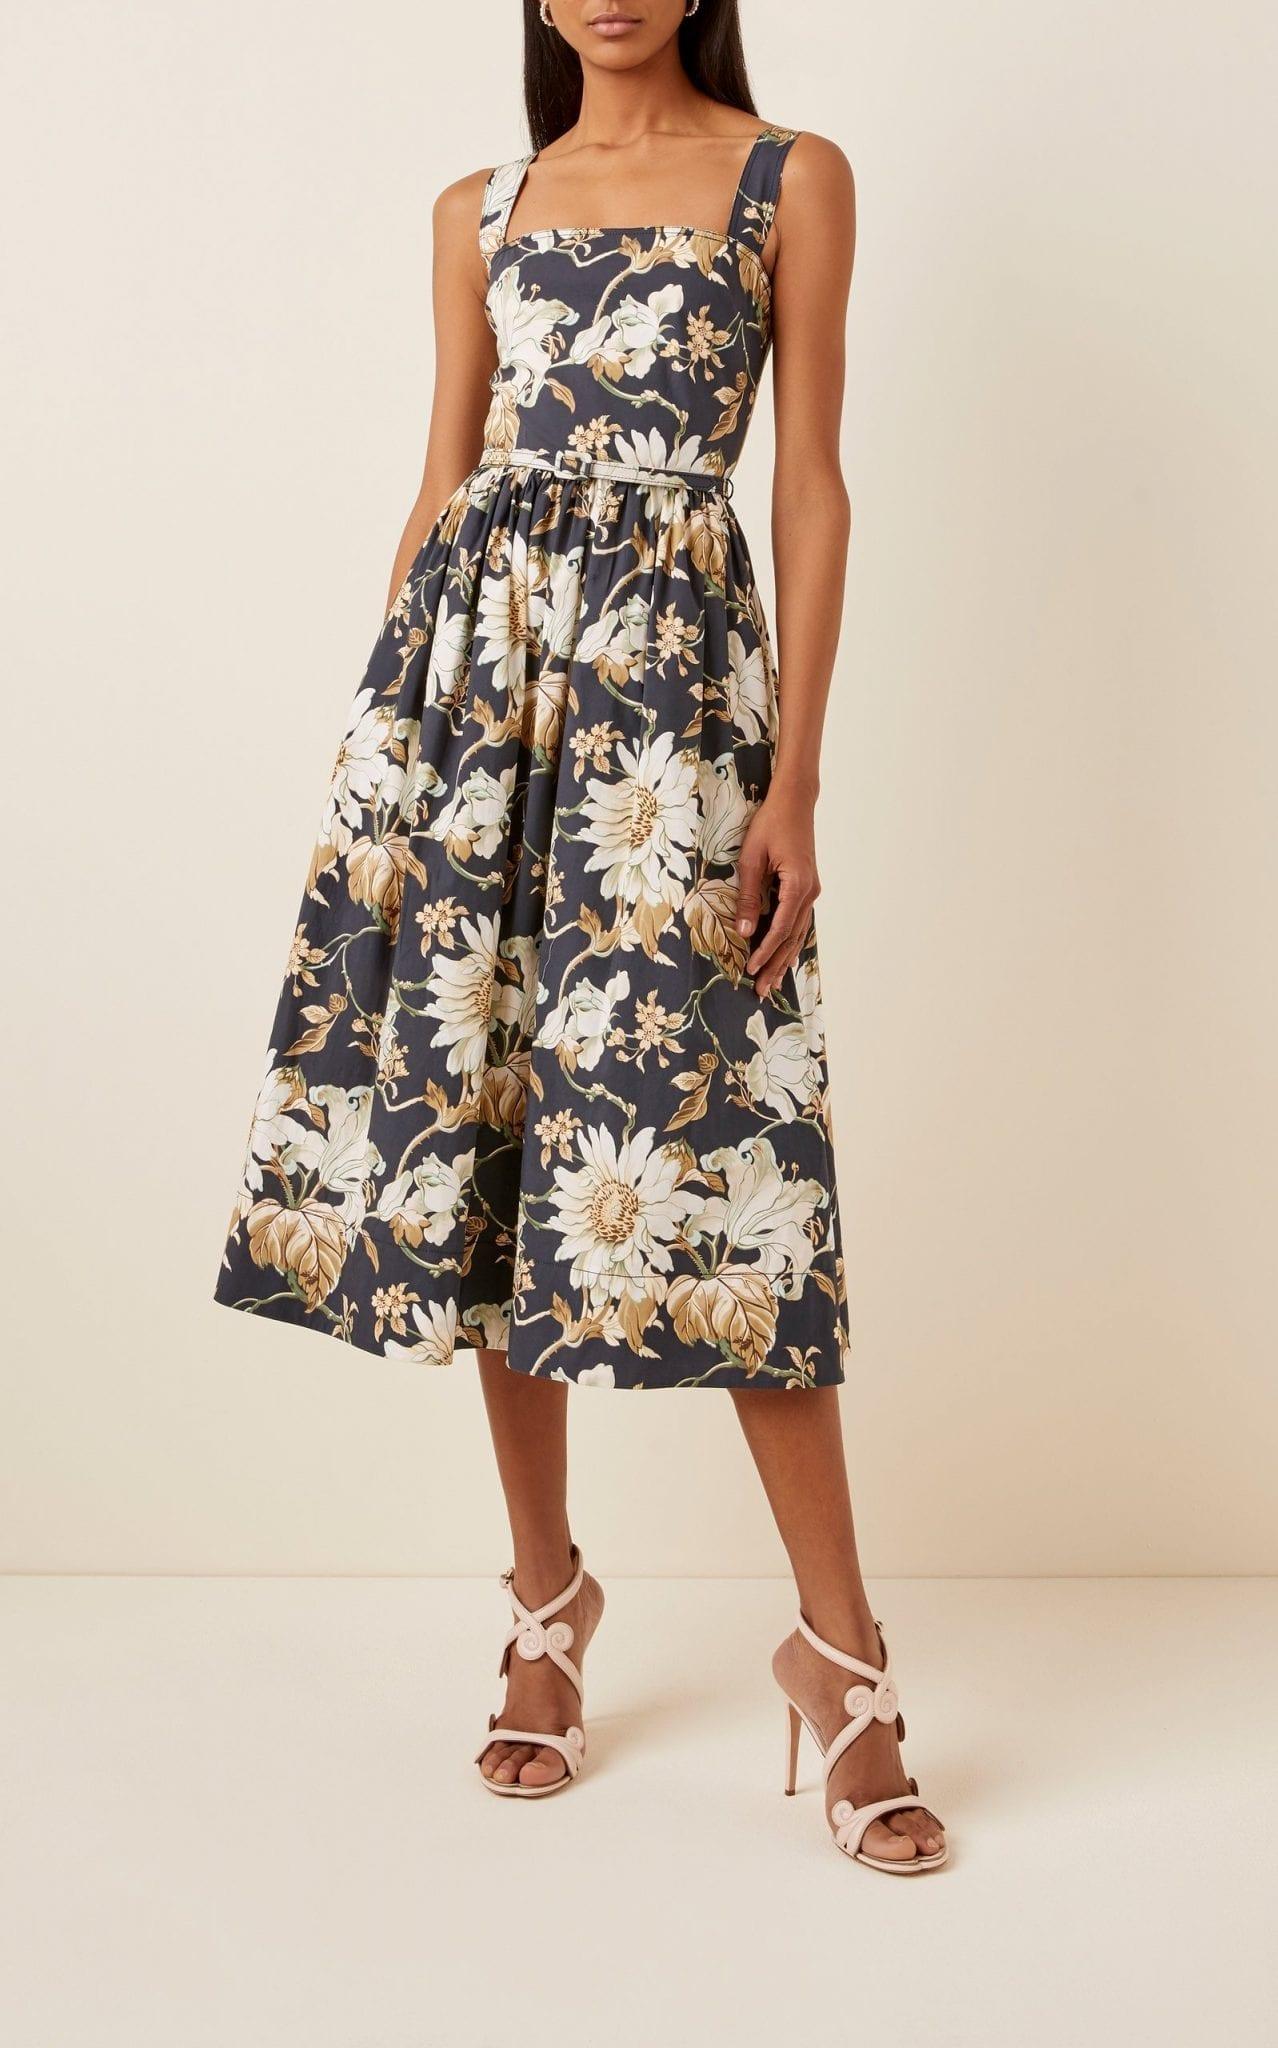 OSCAR DE LA RENTA Flora-Print Pleated Cotton-Blend Dress